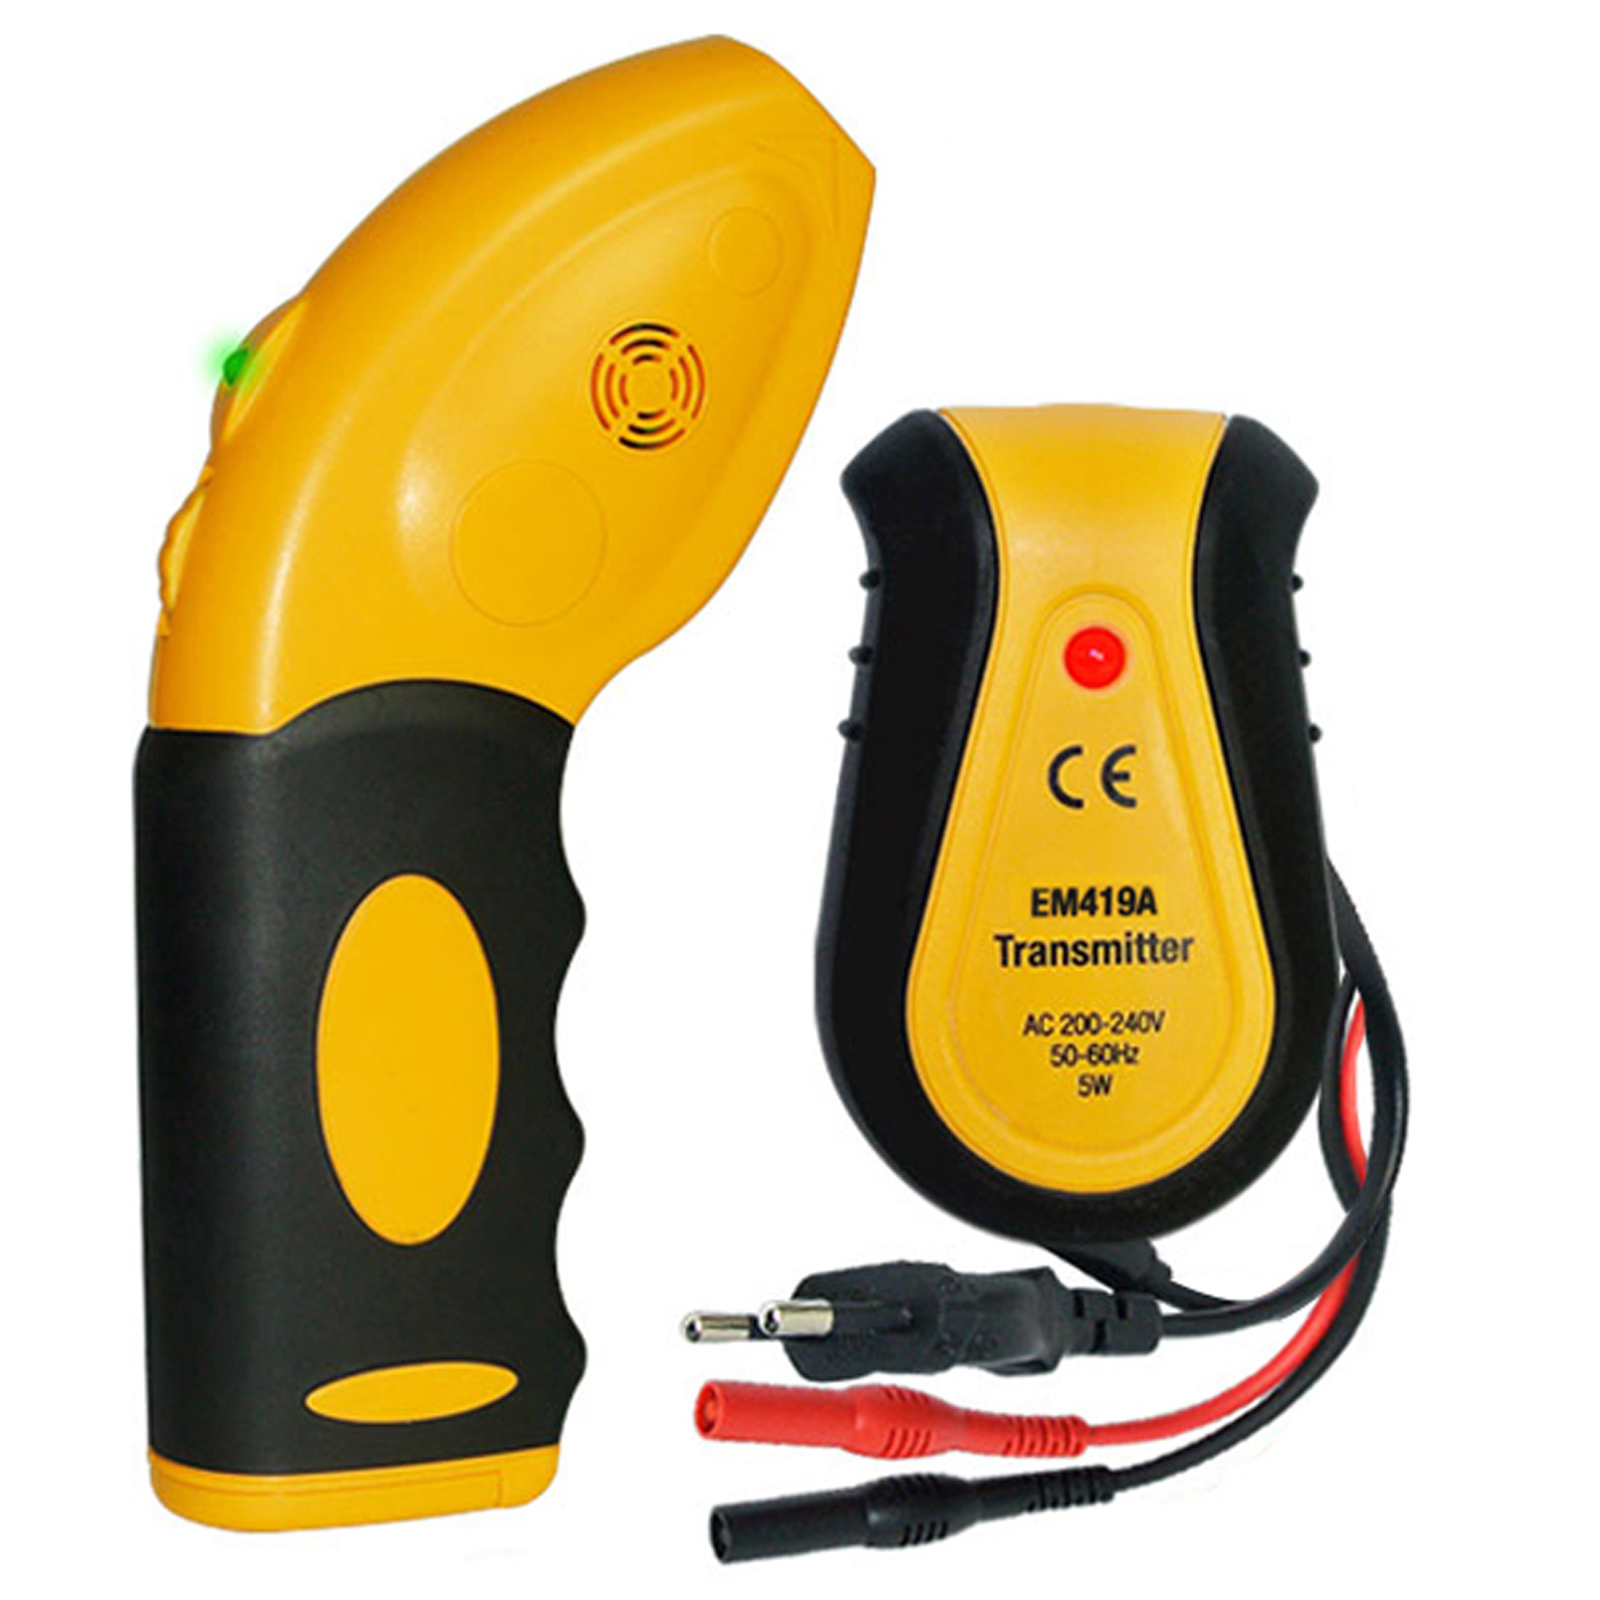 Circuit Breaker Fuse Control Locator Receiver Transmitter Lamp Socket & Outlet Adapters Tester Electrical Finder Tool 220V